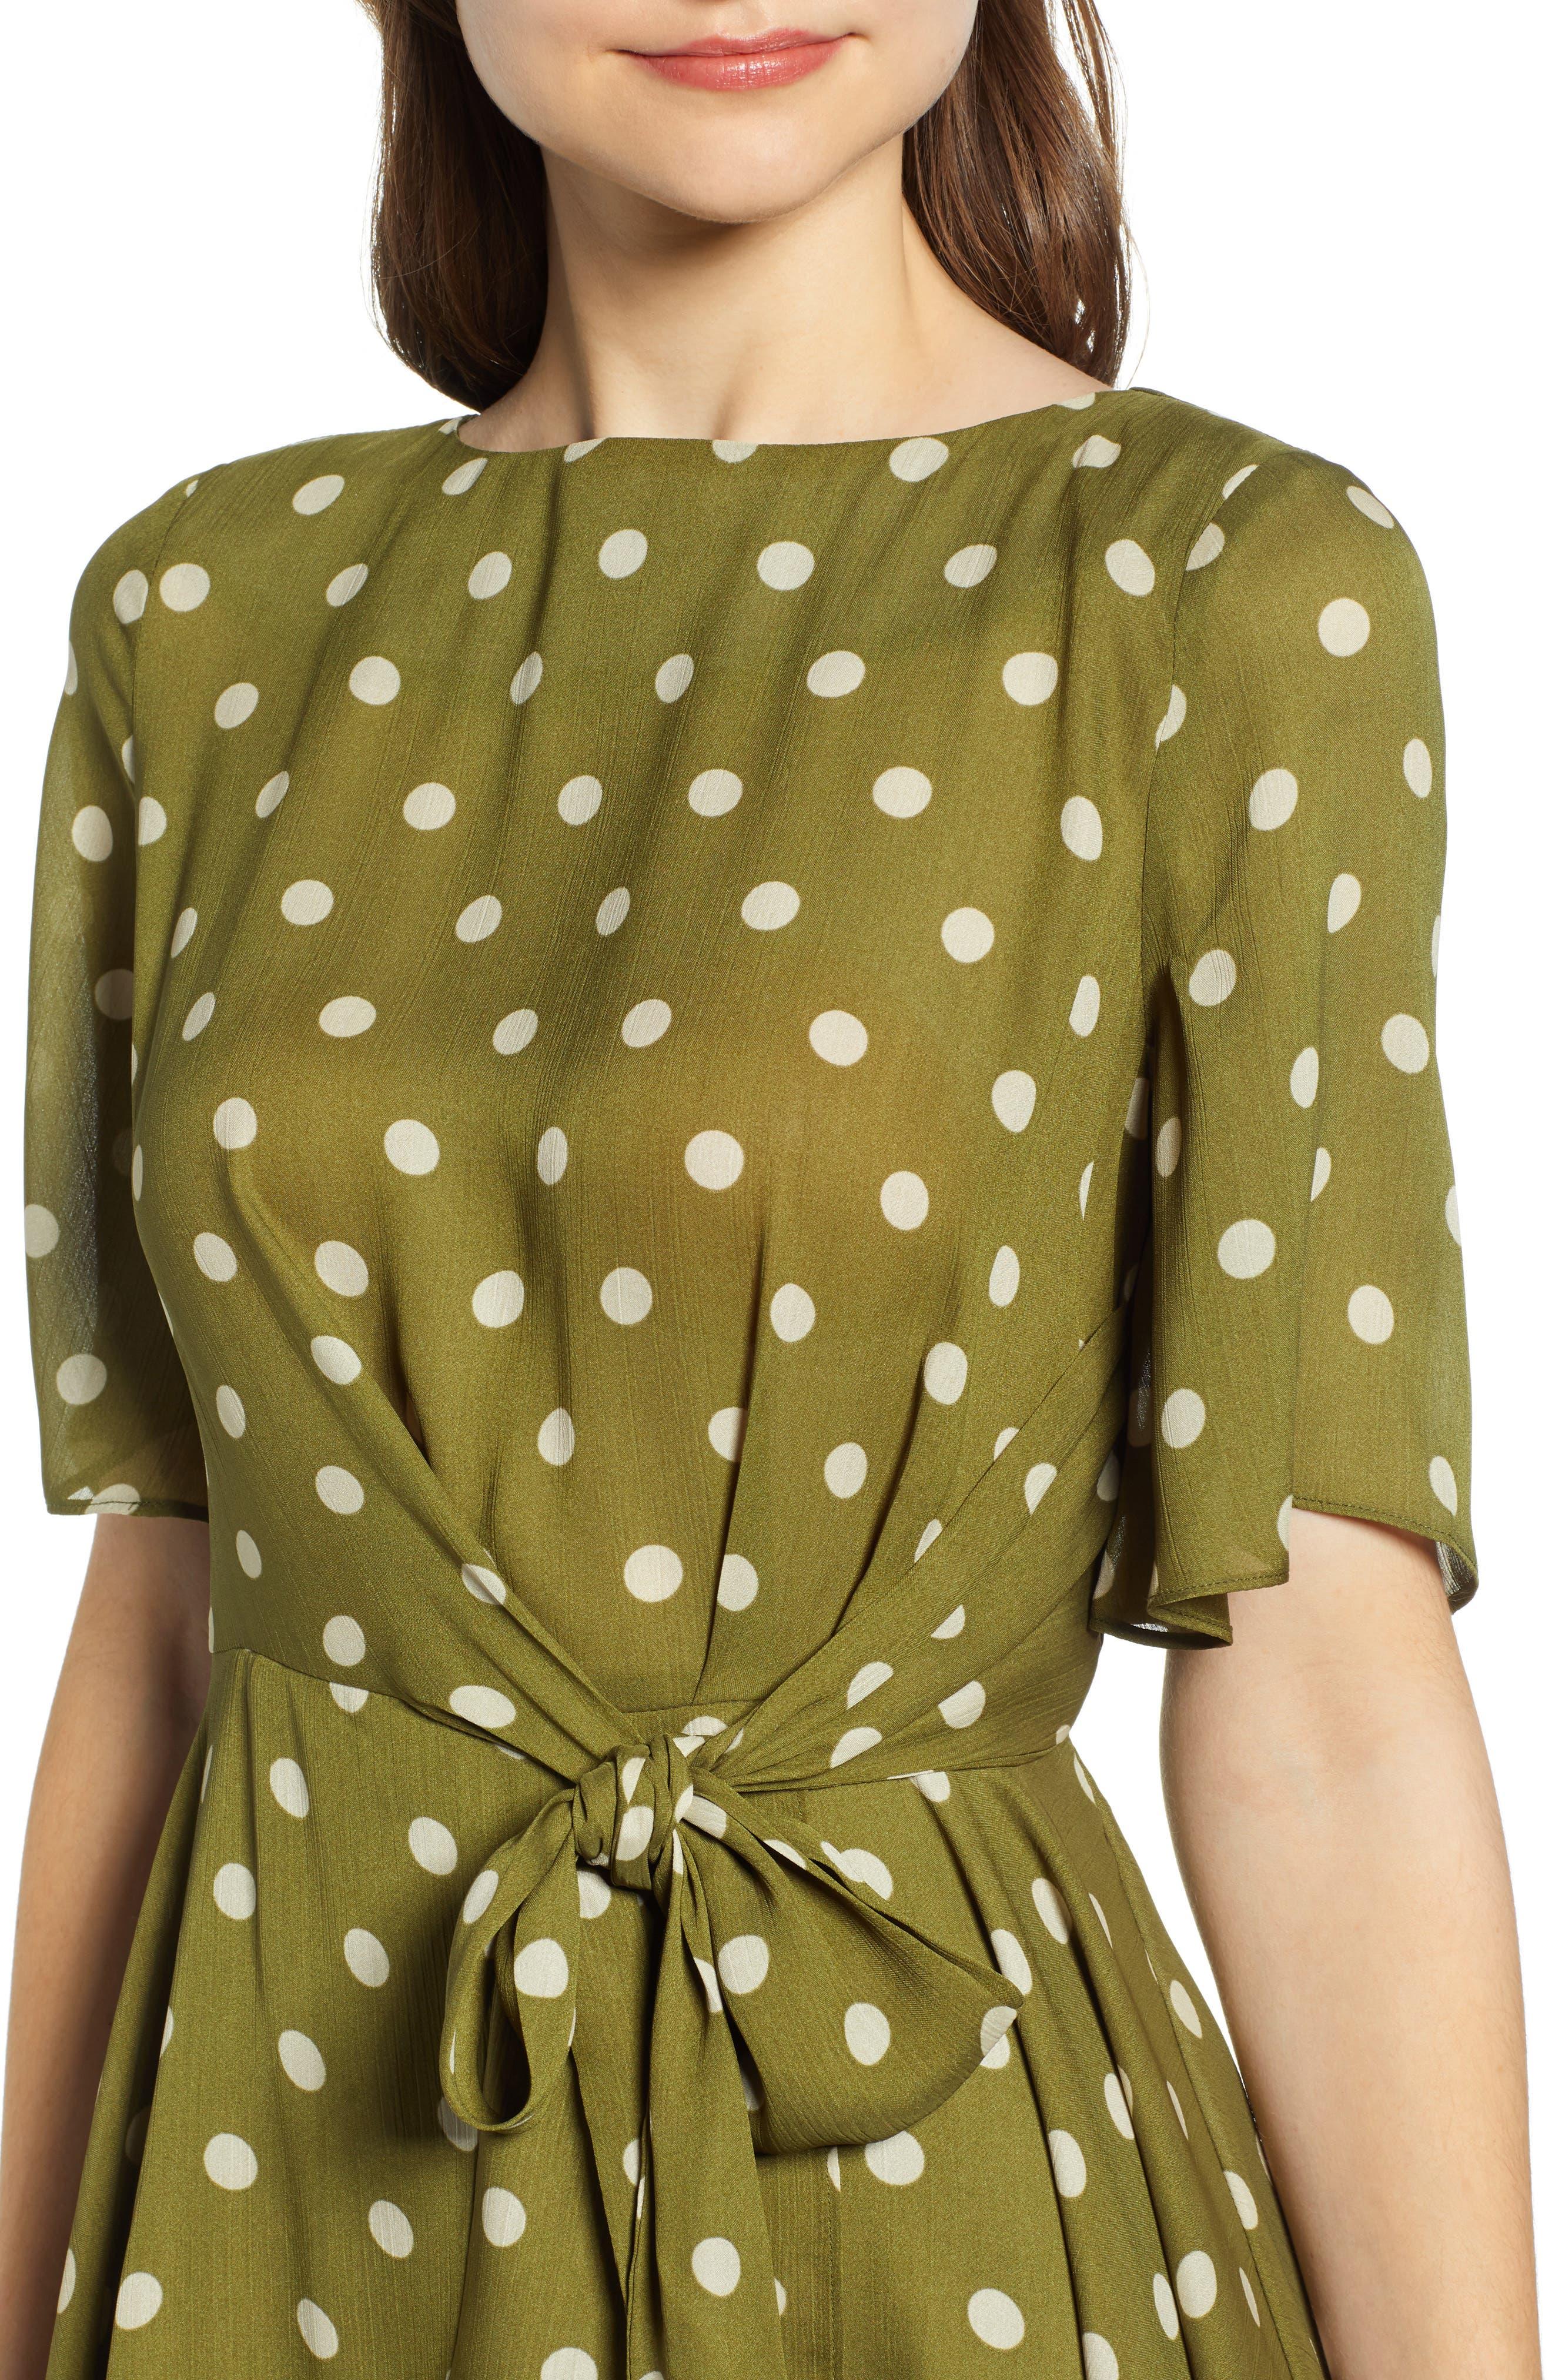 CHRISELLE LIM COLLECTION, Chriselle Lim Marie Handkerchief Hem Midi Dress, Alternate thumbnail 5, color, CREAM/ OLIVE